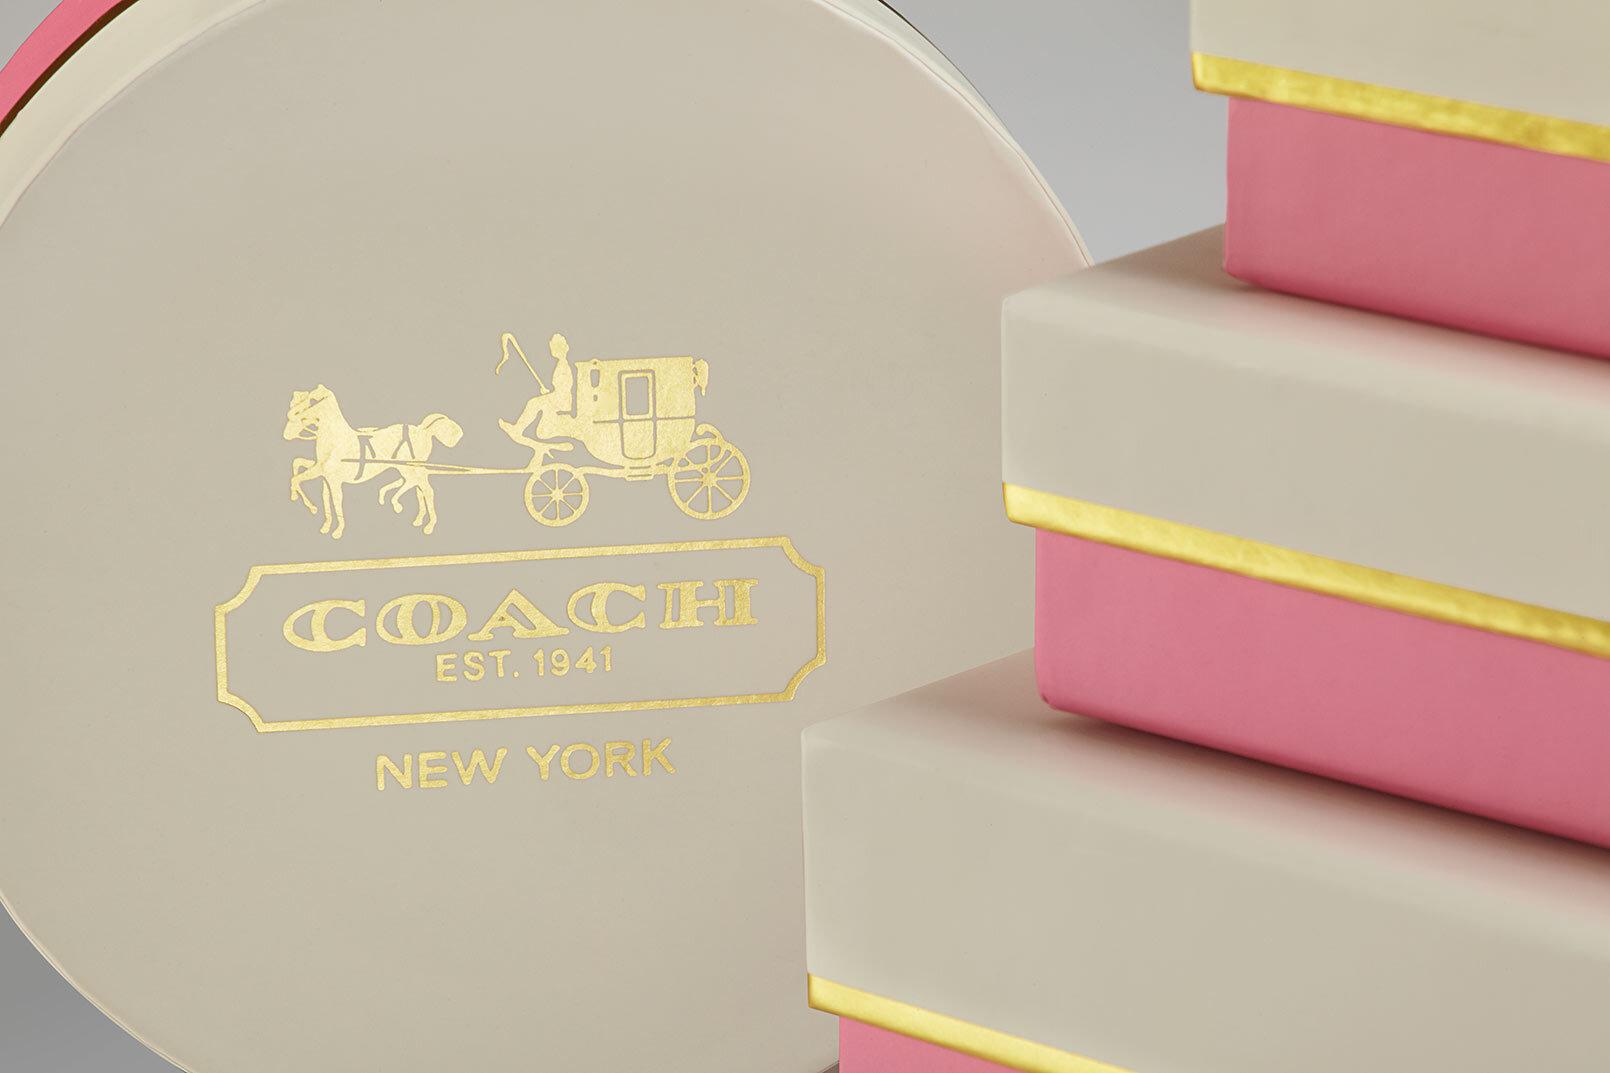 Coach-Box-Holiday-Design-Packaging-Company-7.jpg